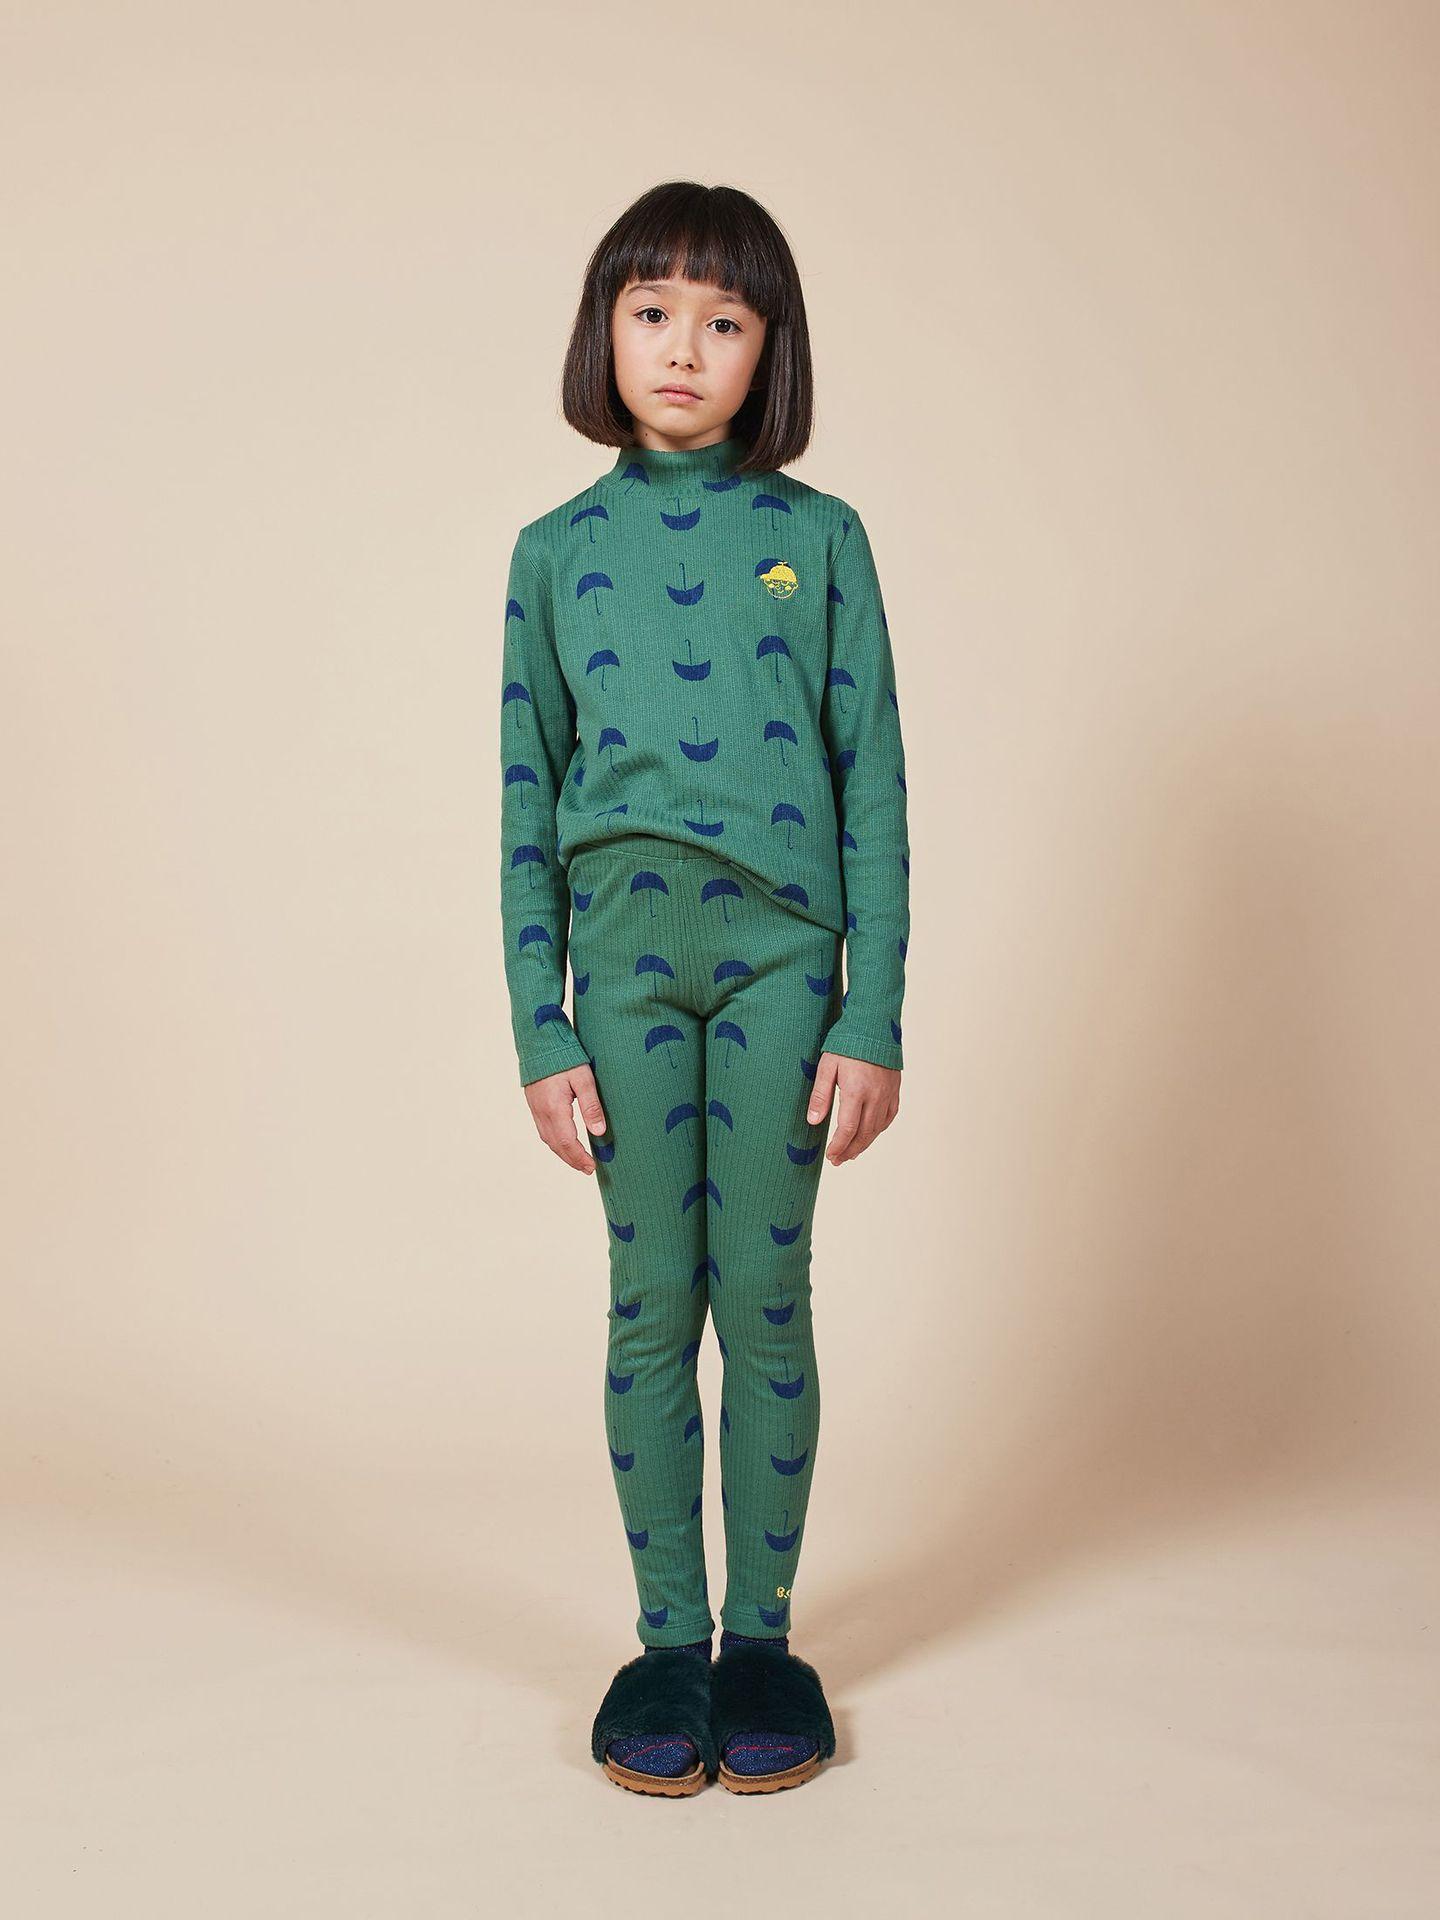 2020 Autumn Winter Girls Clothing Sets Pajama Sets Kids Clothes Vestidos  Long Sleeved T shirts+ Leggings Christmas Clothing 2